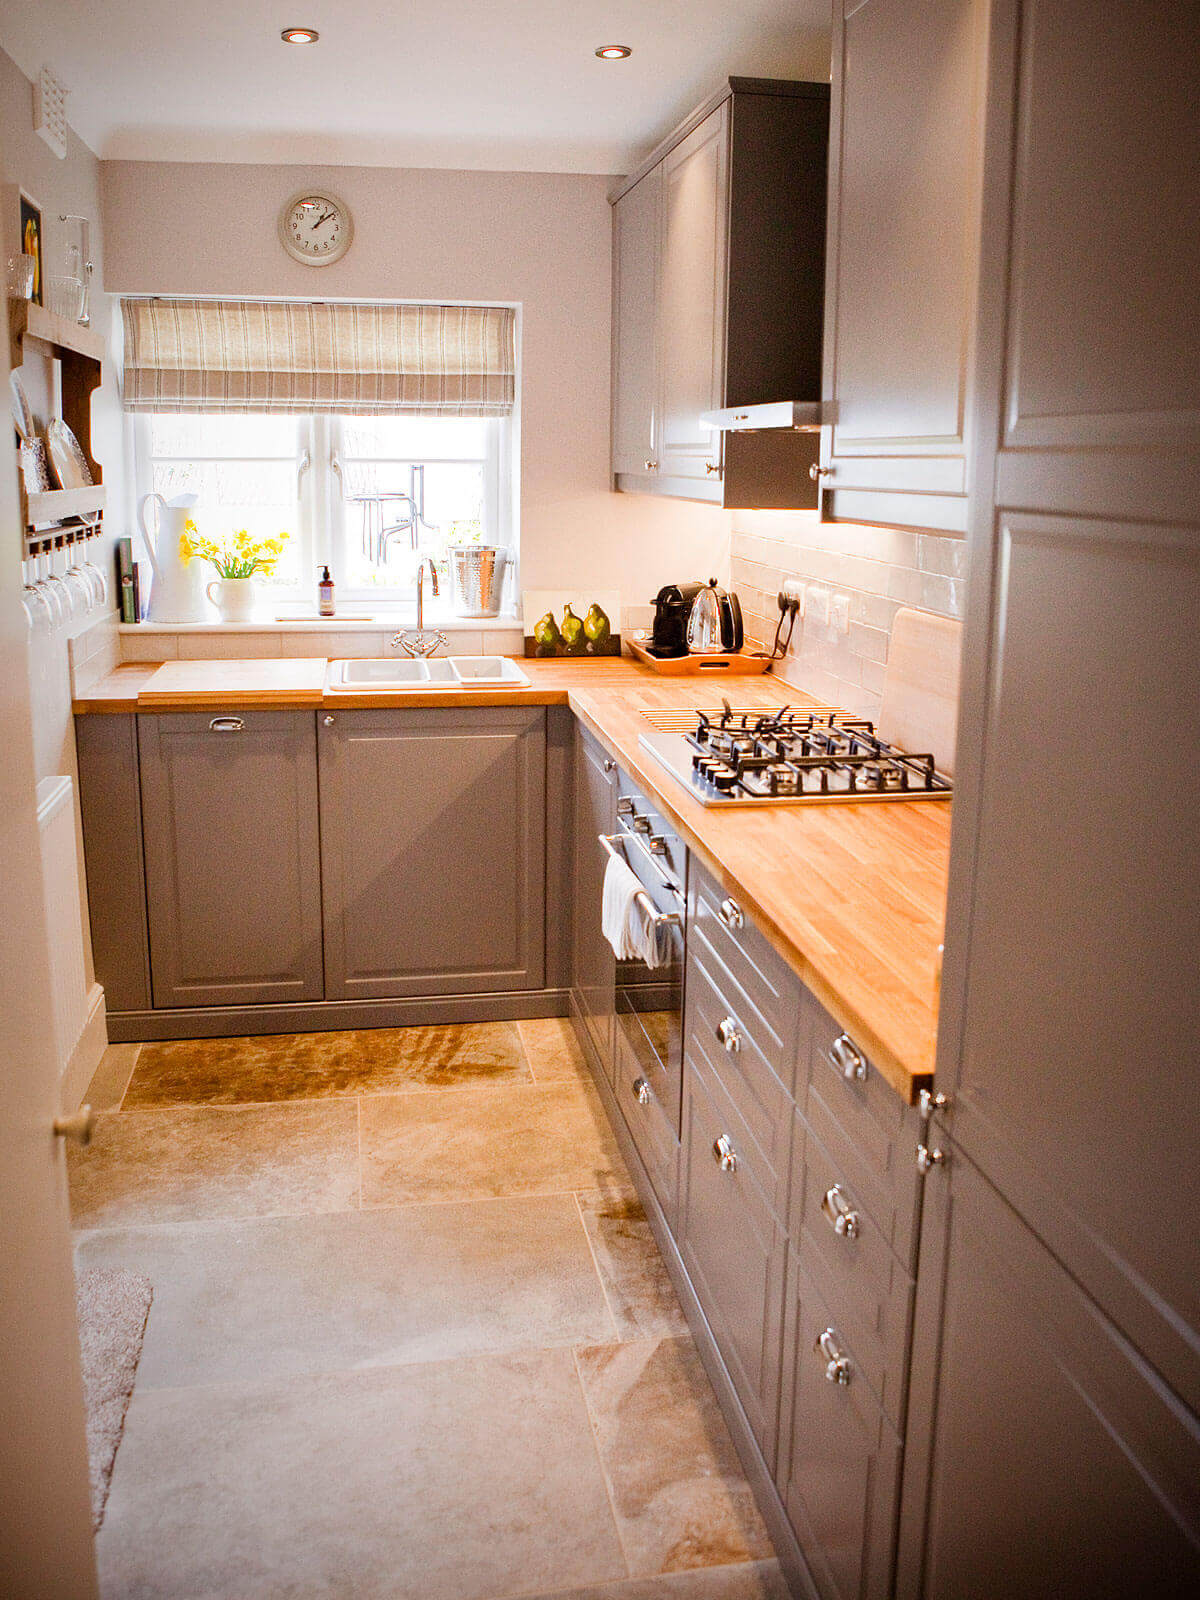 Kitchen Porcelain Floor Tiles